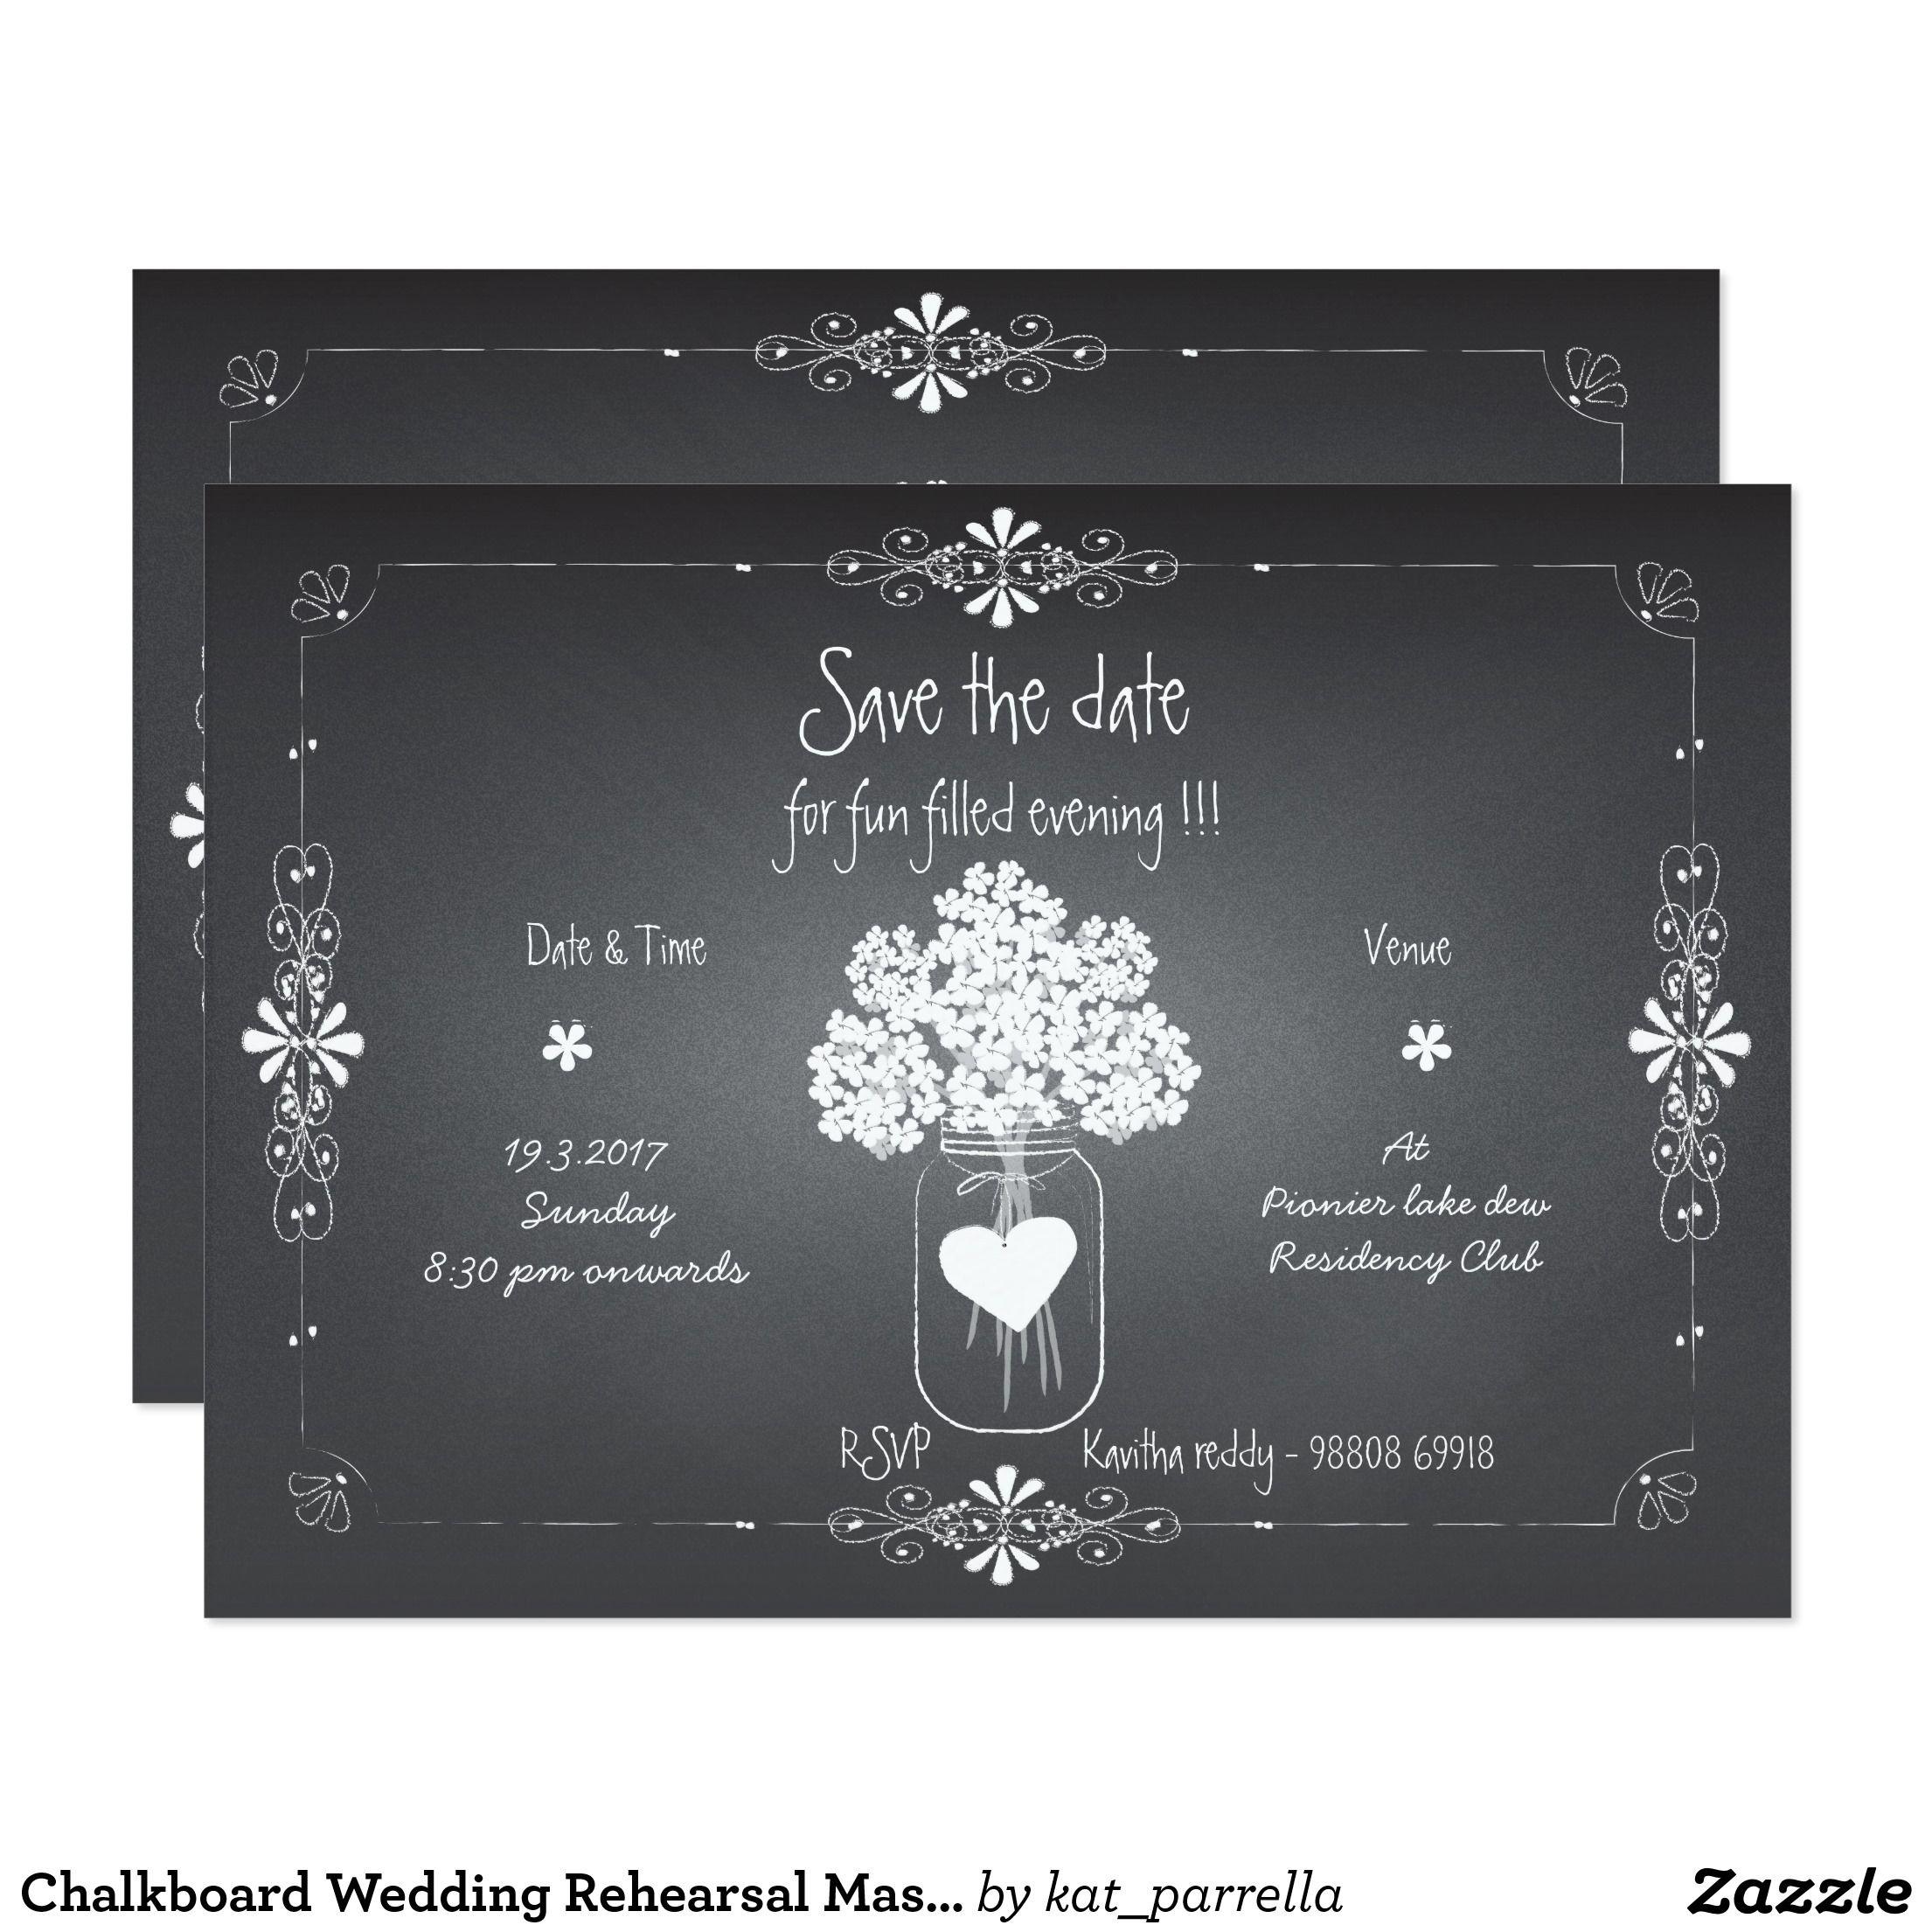 Chalkboard wedding rehearsal mason jar invitation chalkboards